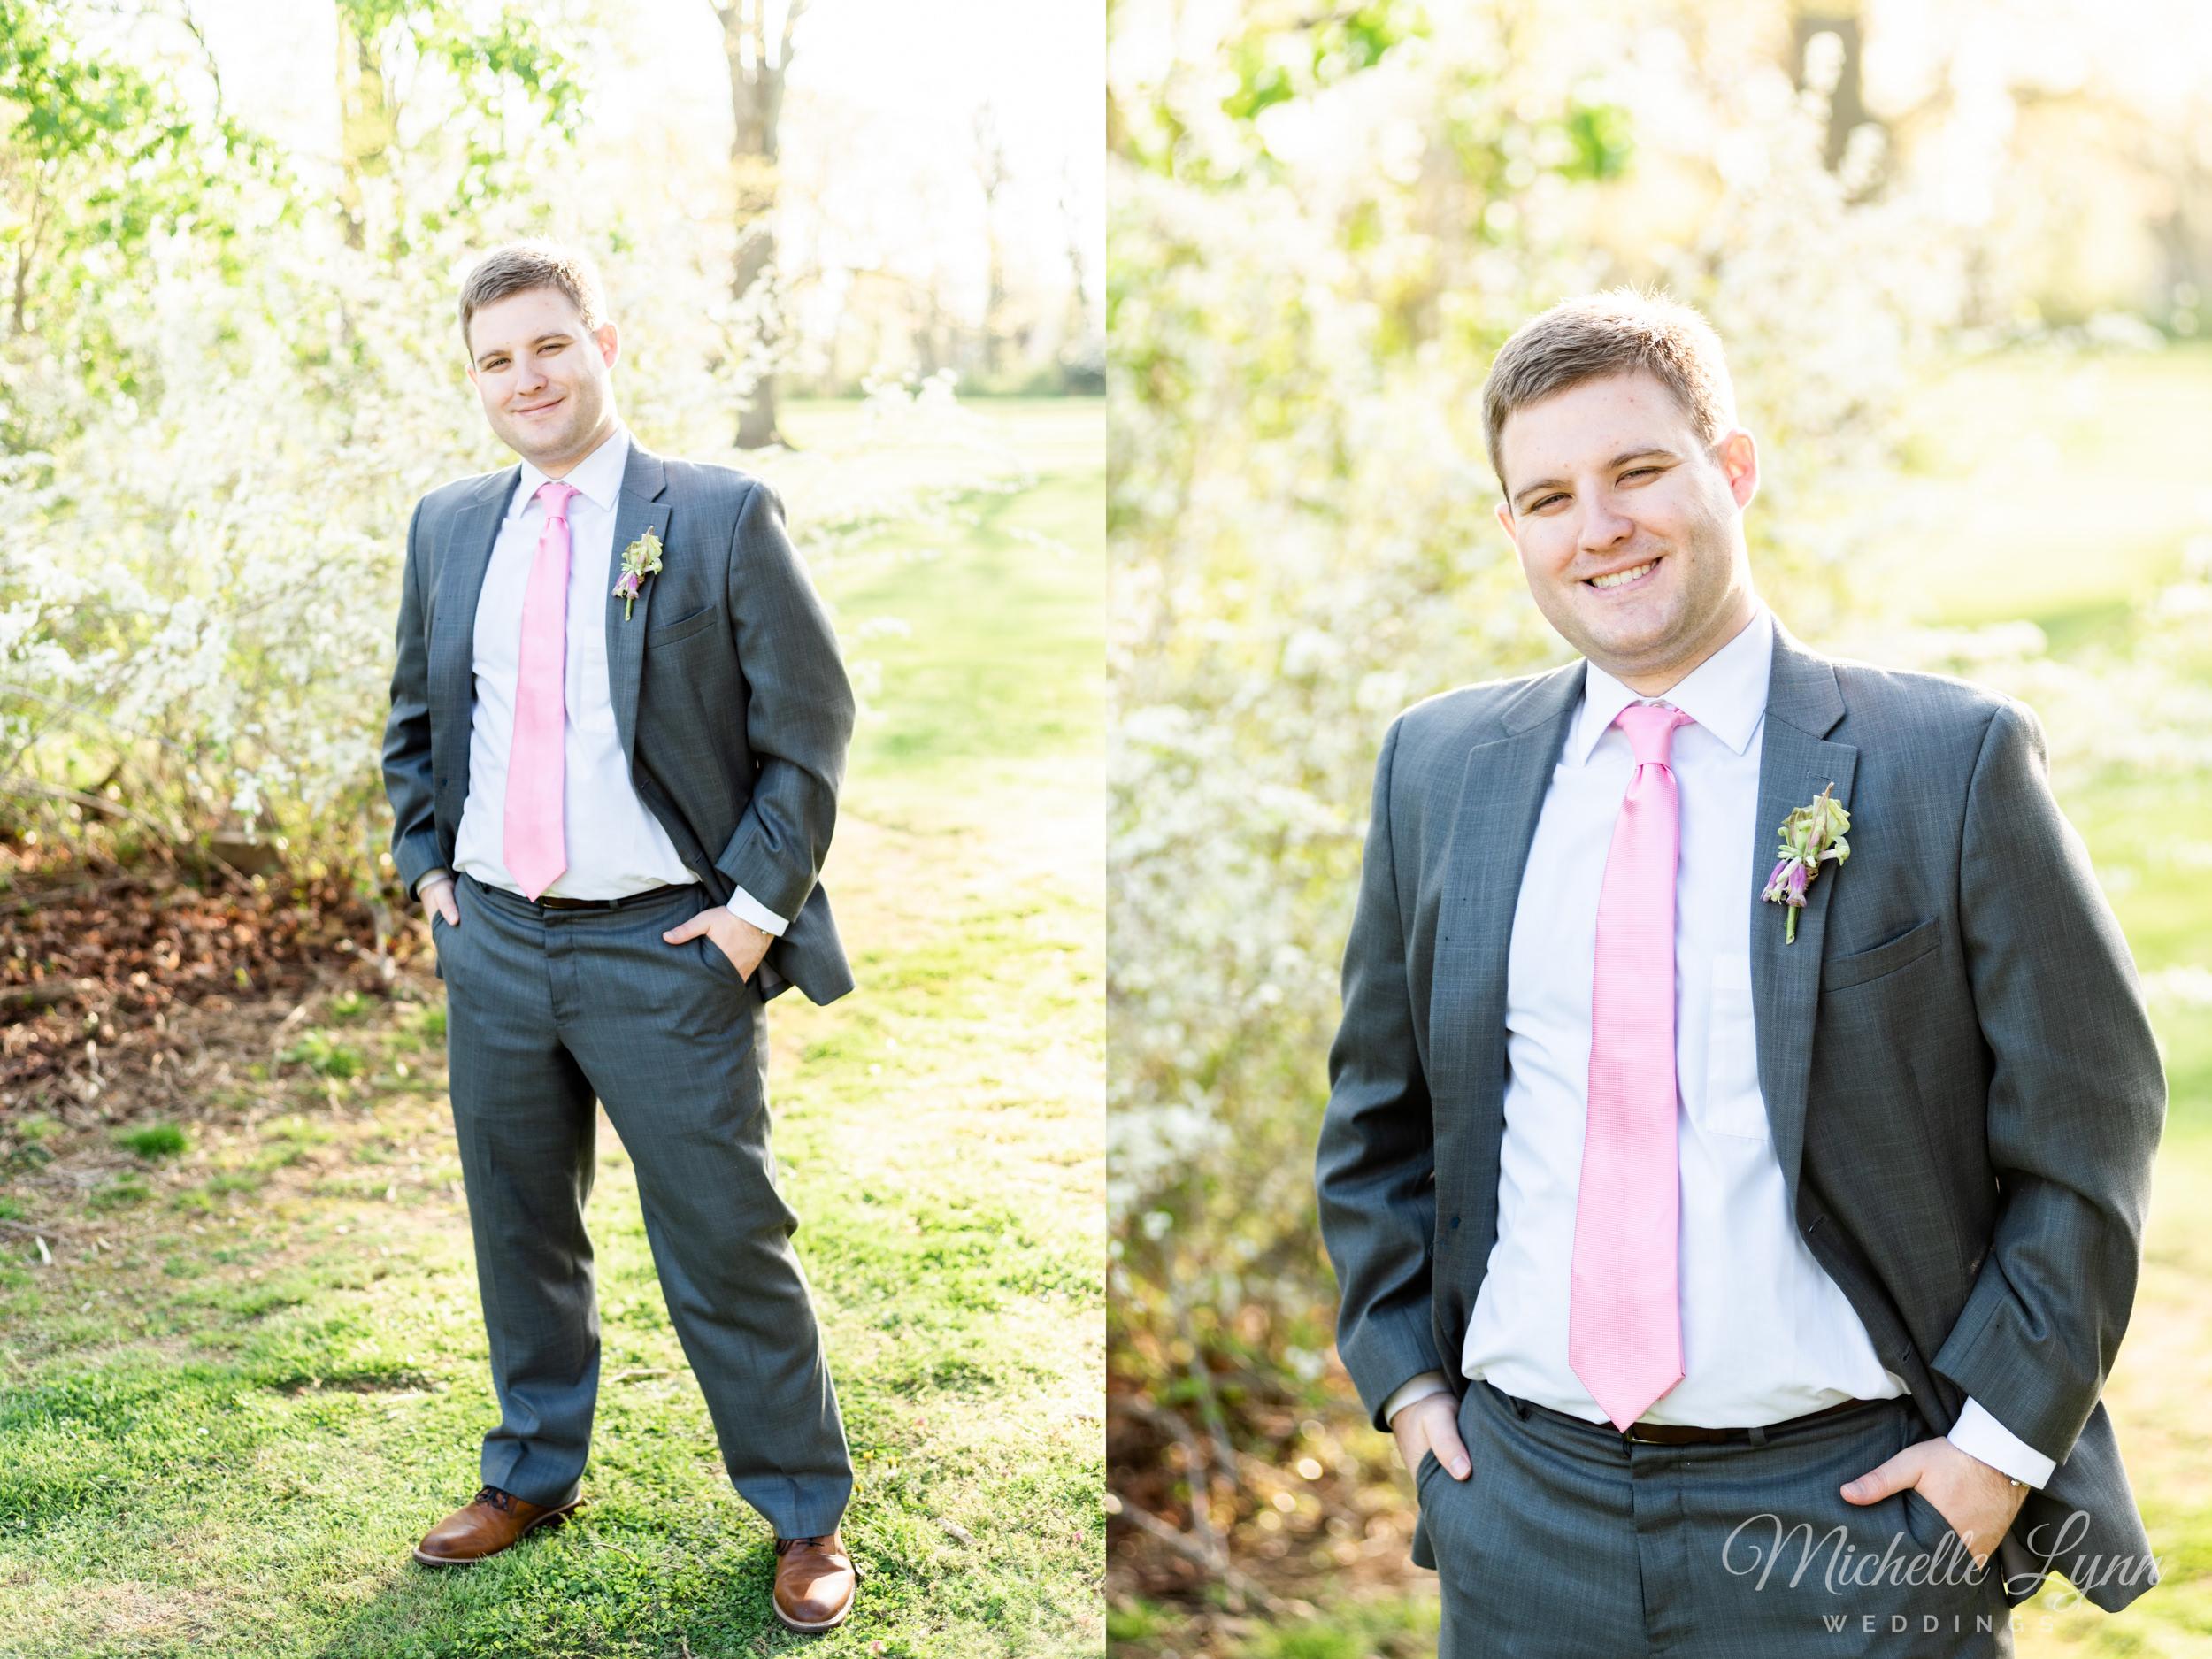 mlw-whitehall-annapolis-maryland-wedding-35.jpg